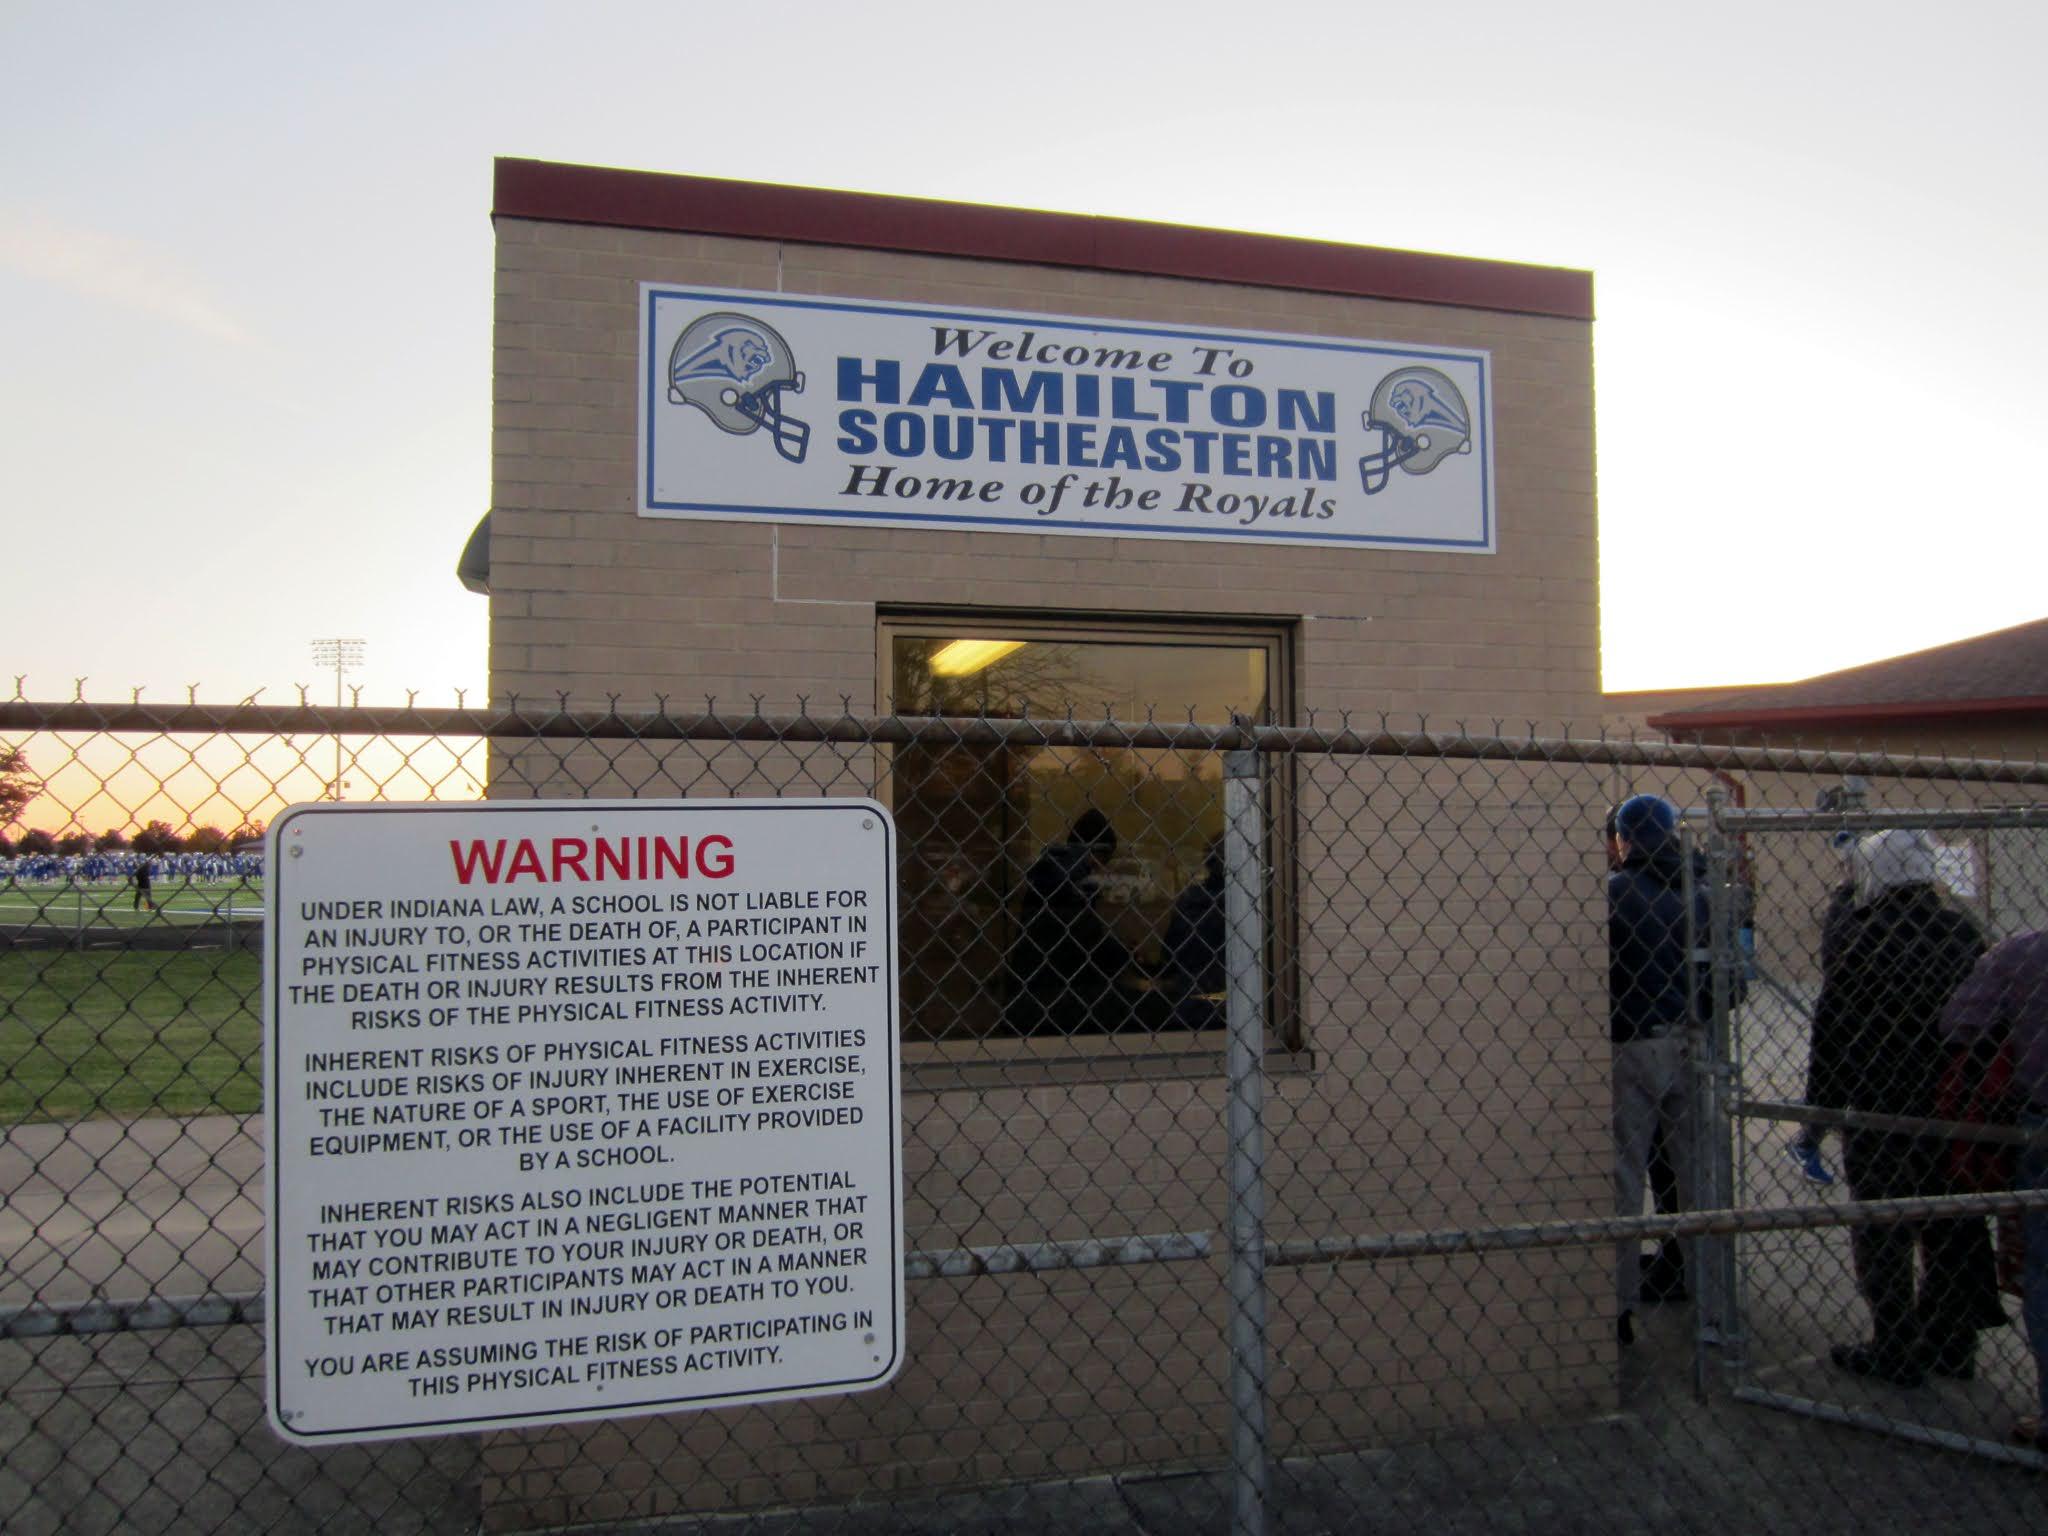 Entrance gate at Hamilton Southeastern High School's Royals Stadium